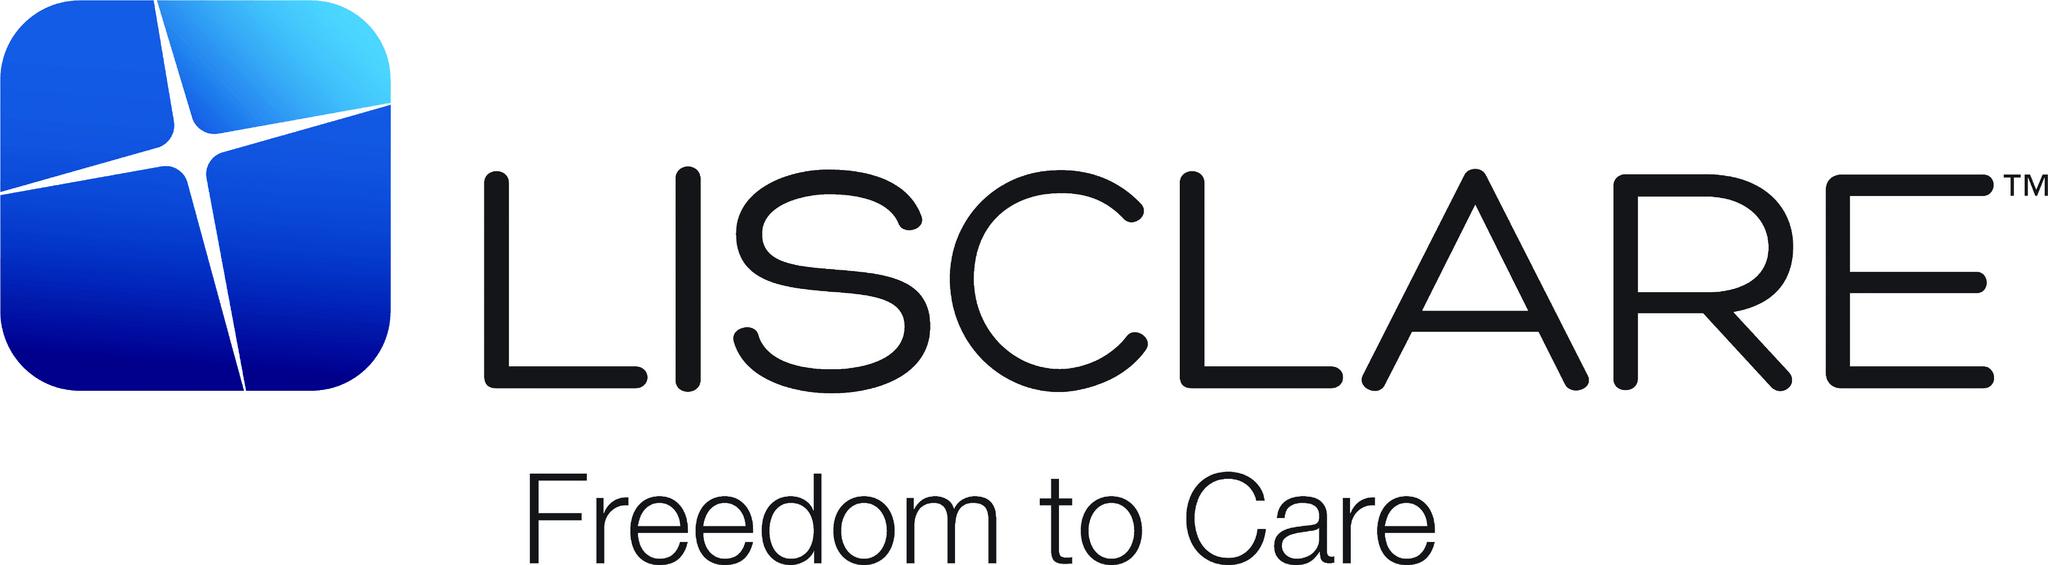 Lisclare Ltd